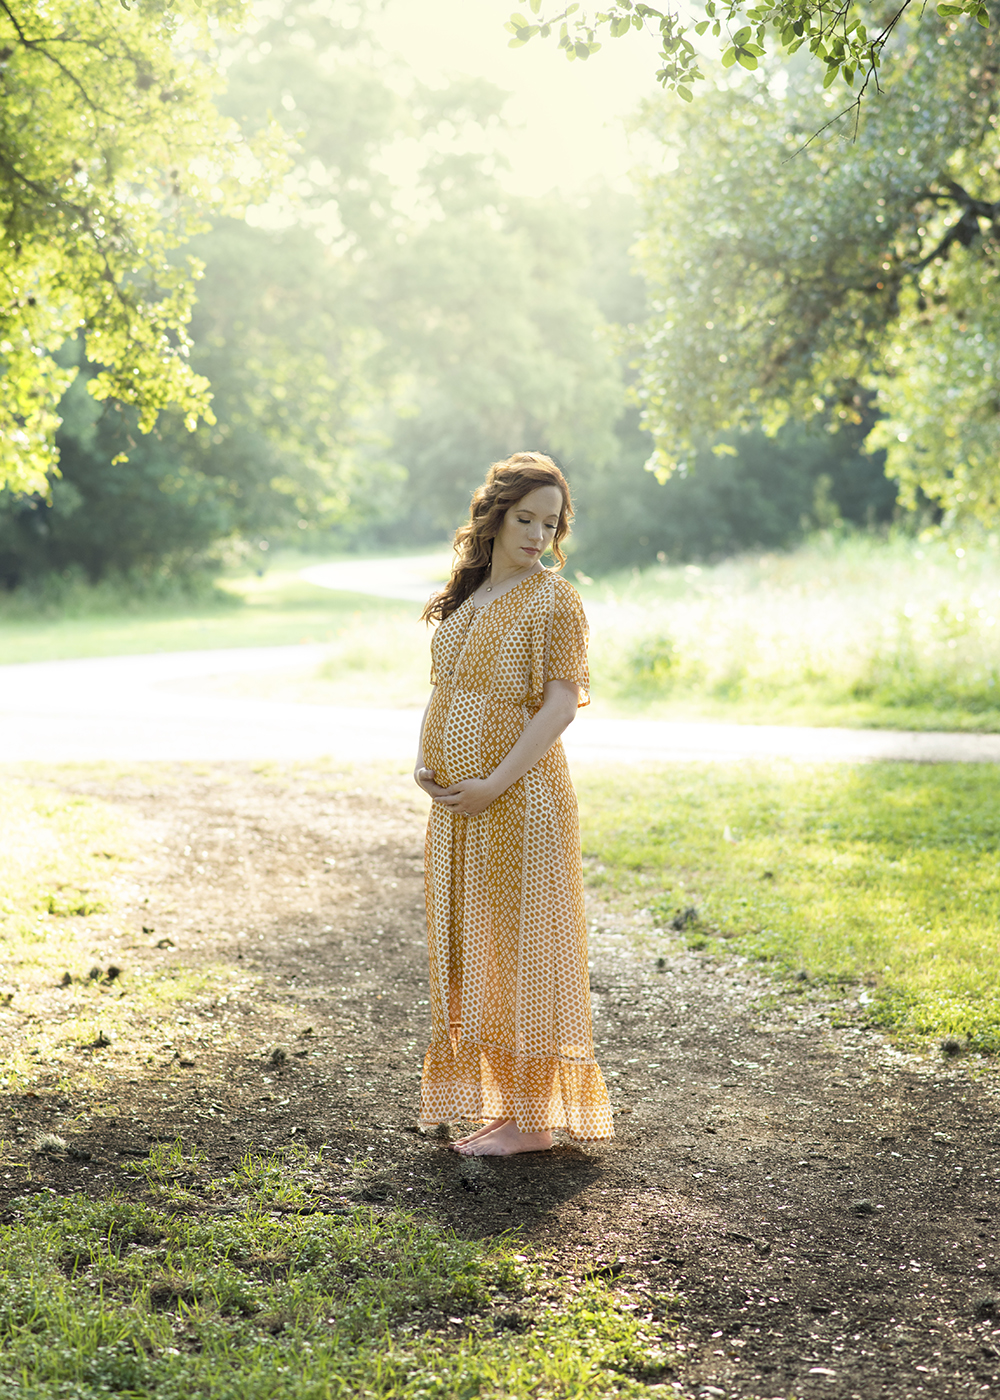 San Antonio Area Maternity Portrait At Walker Ranch Historical Landmark Park